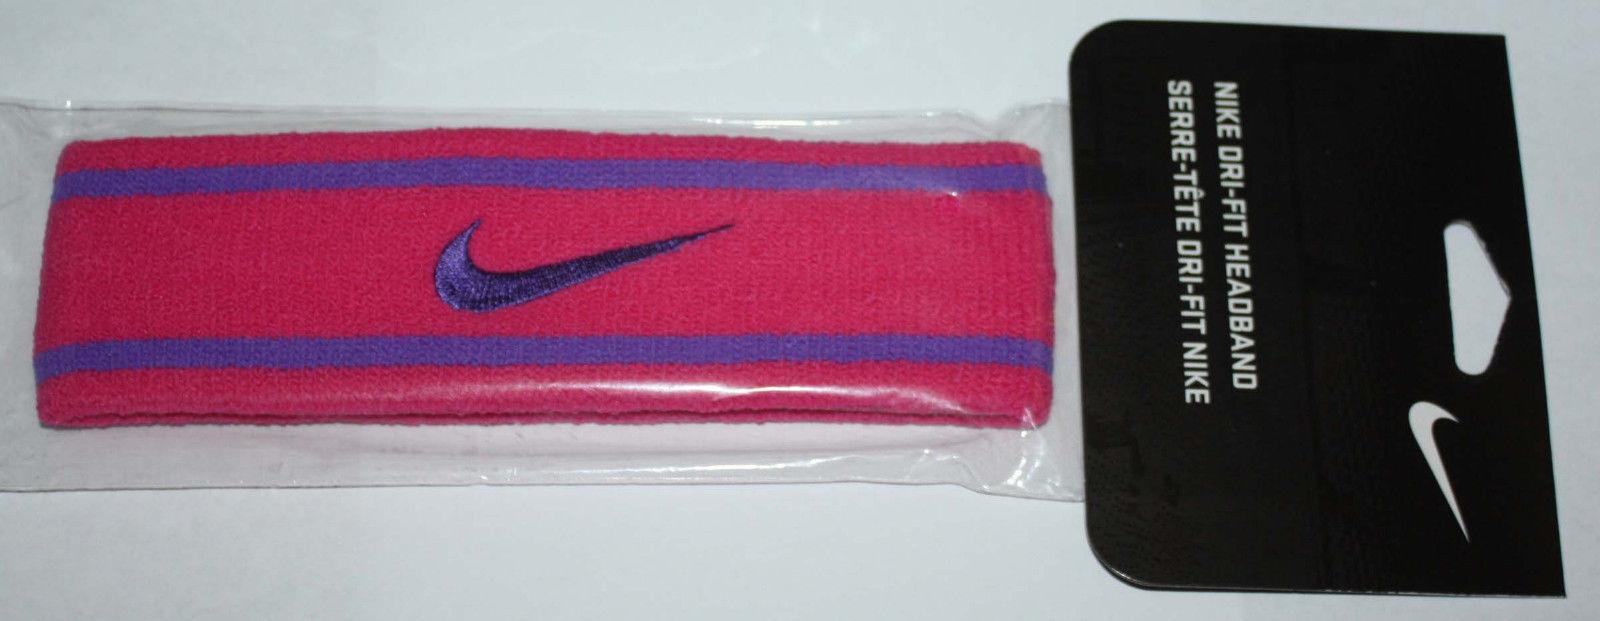 Nike Unisex Dri-Fit Headband Vivid Pink/Purple Venom Stripes/Swoosh (One Size) 10869